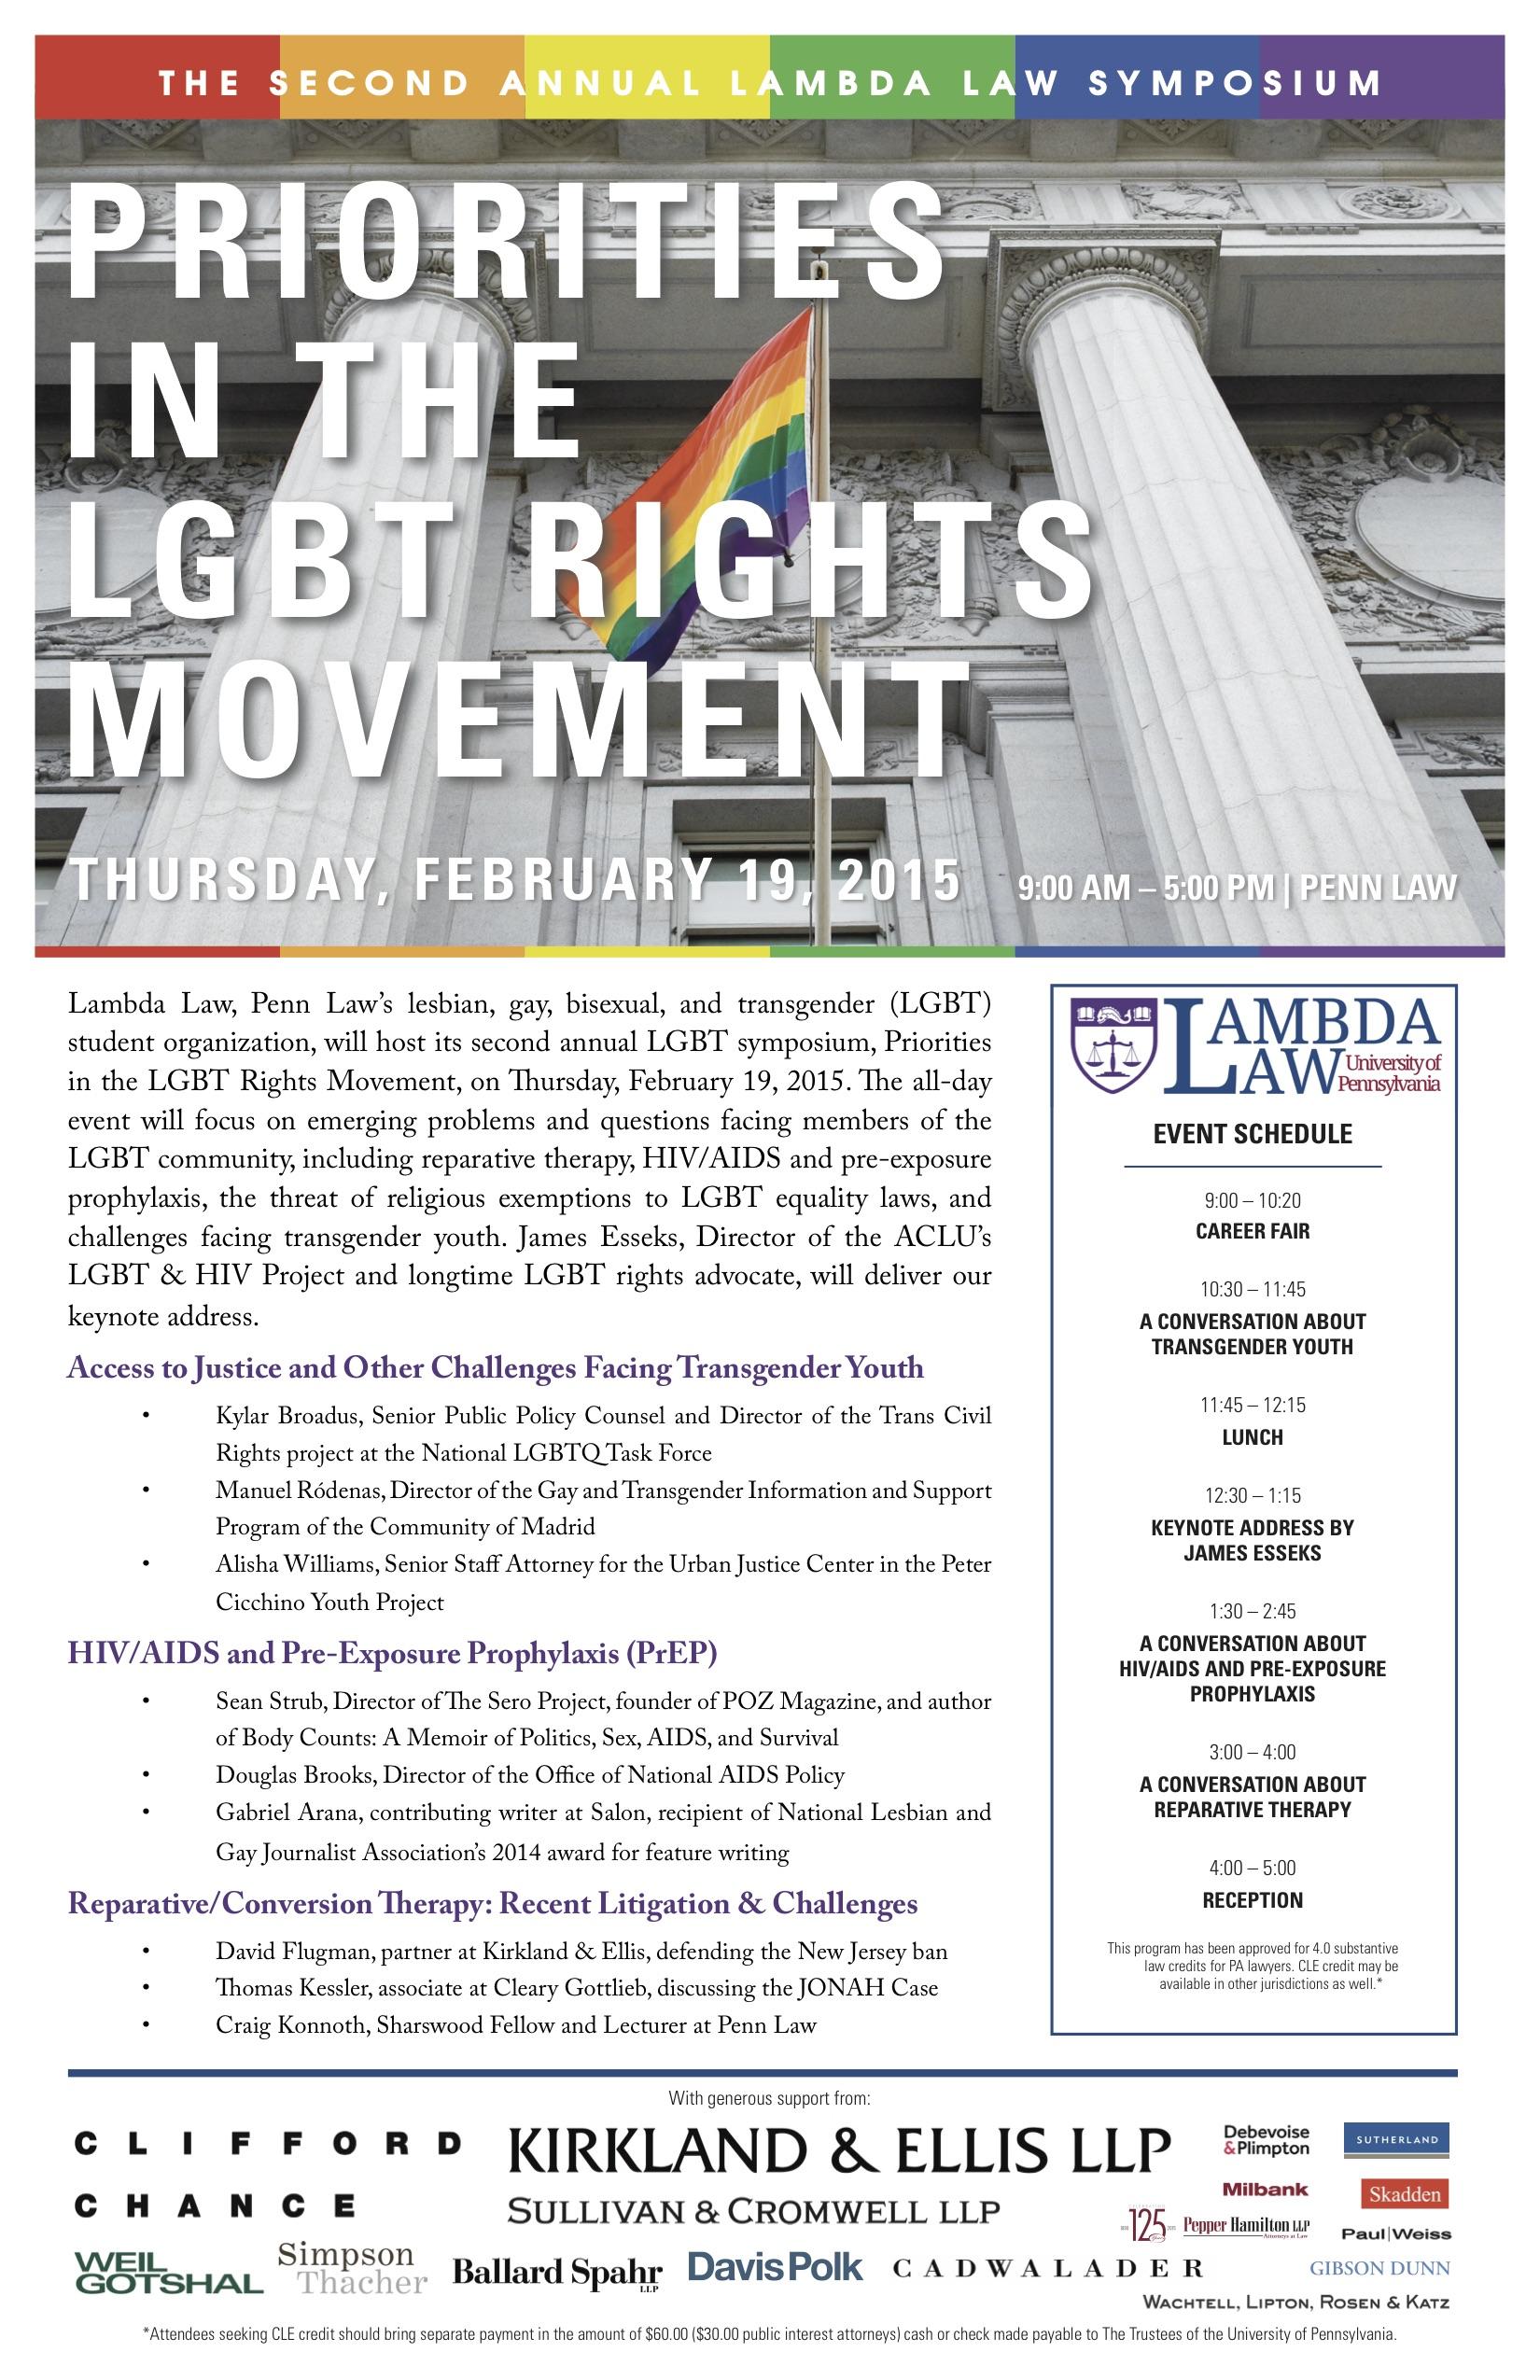 Penn Law Lambda 2015 Symposium Poster